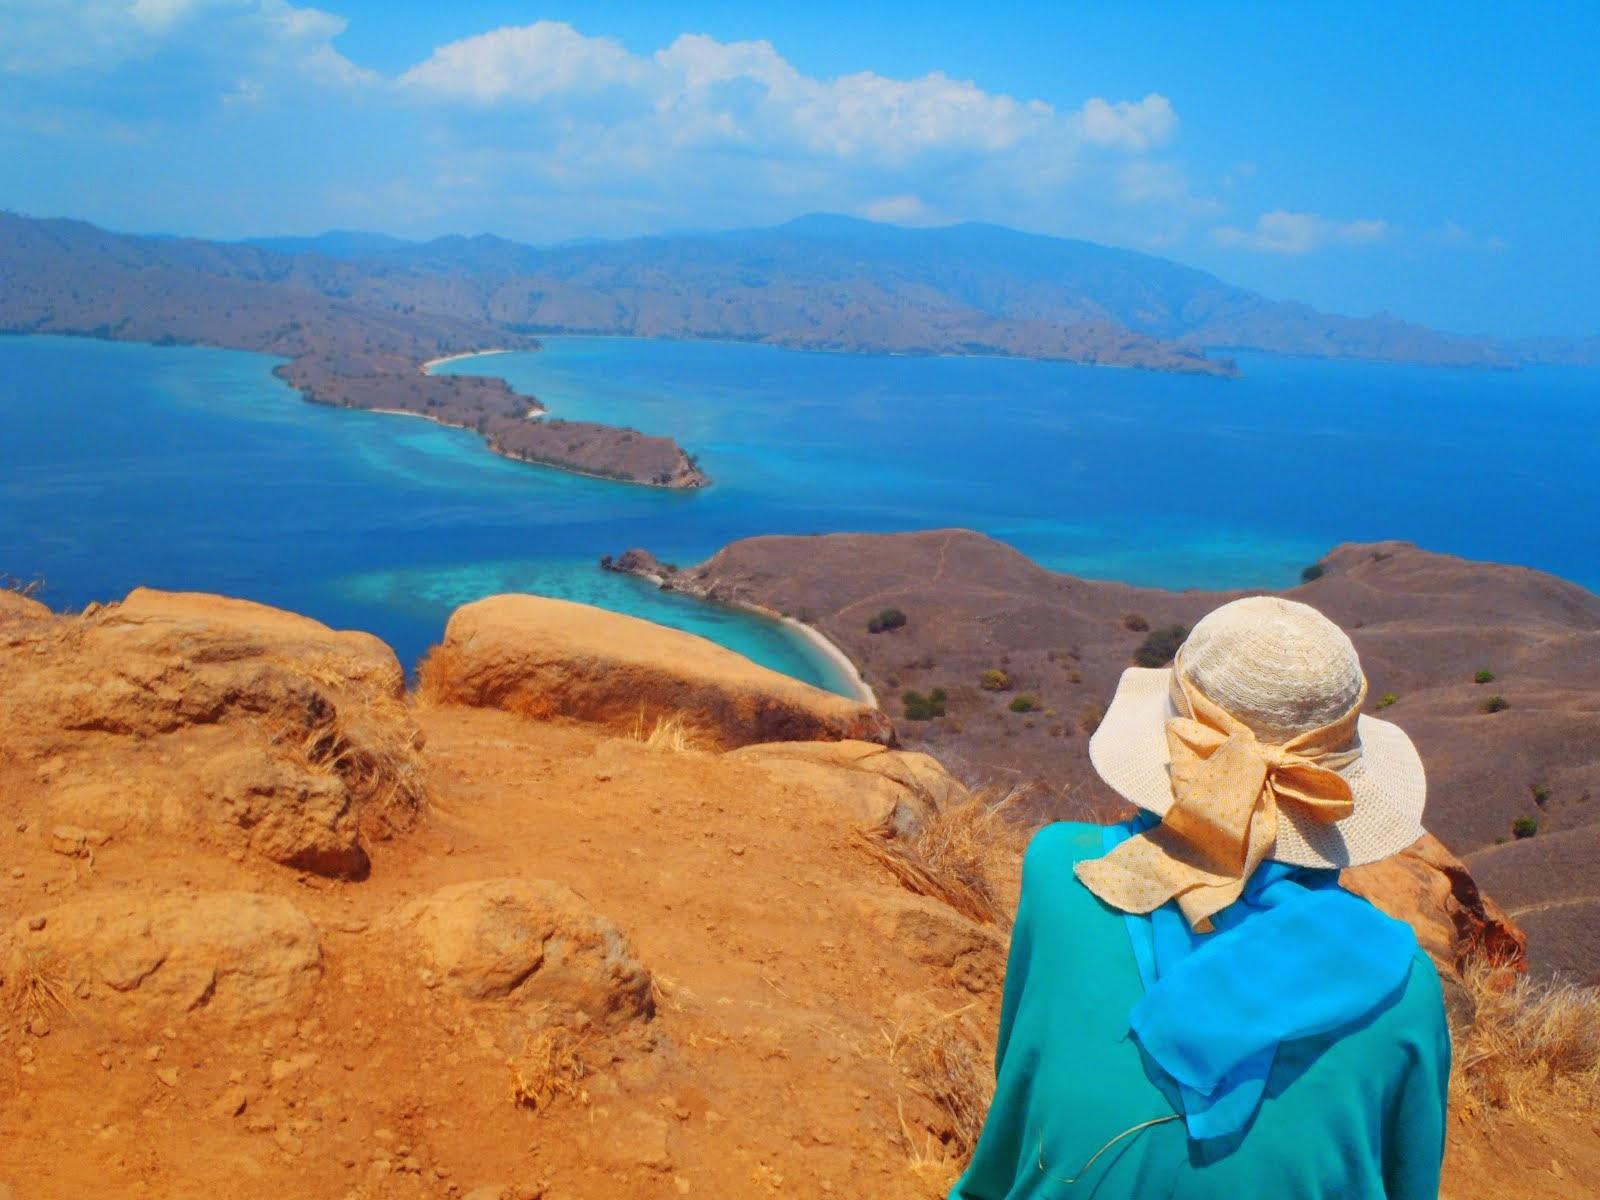 Visit my travelblog